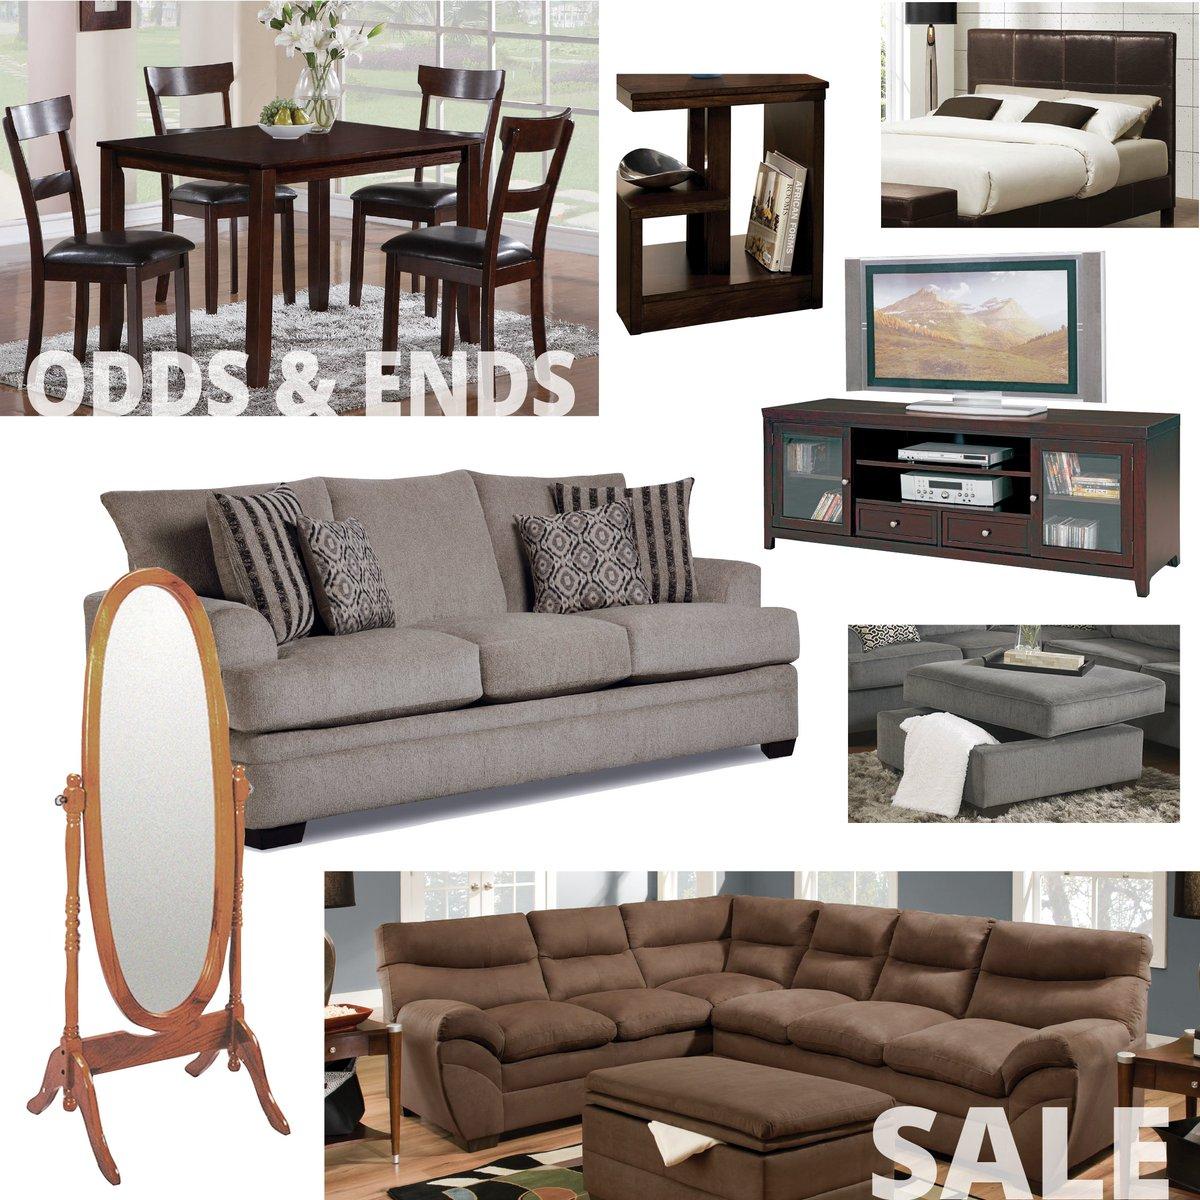 Darvin Furniture Sunday May 7th 19111 Darvin Drive Mokena Il